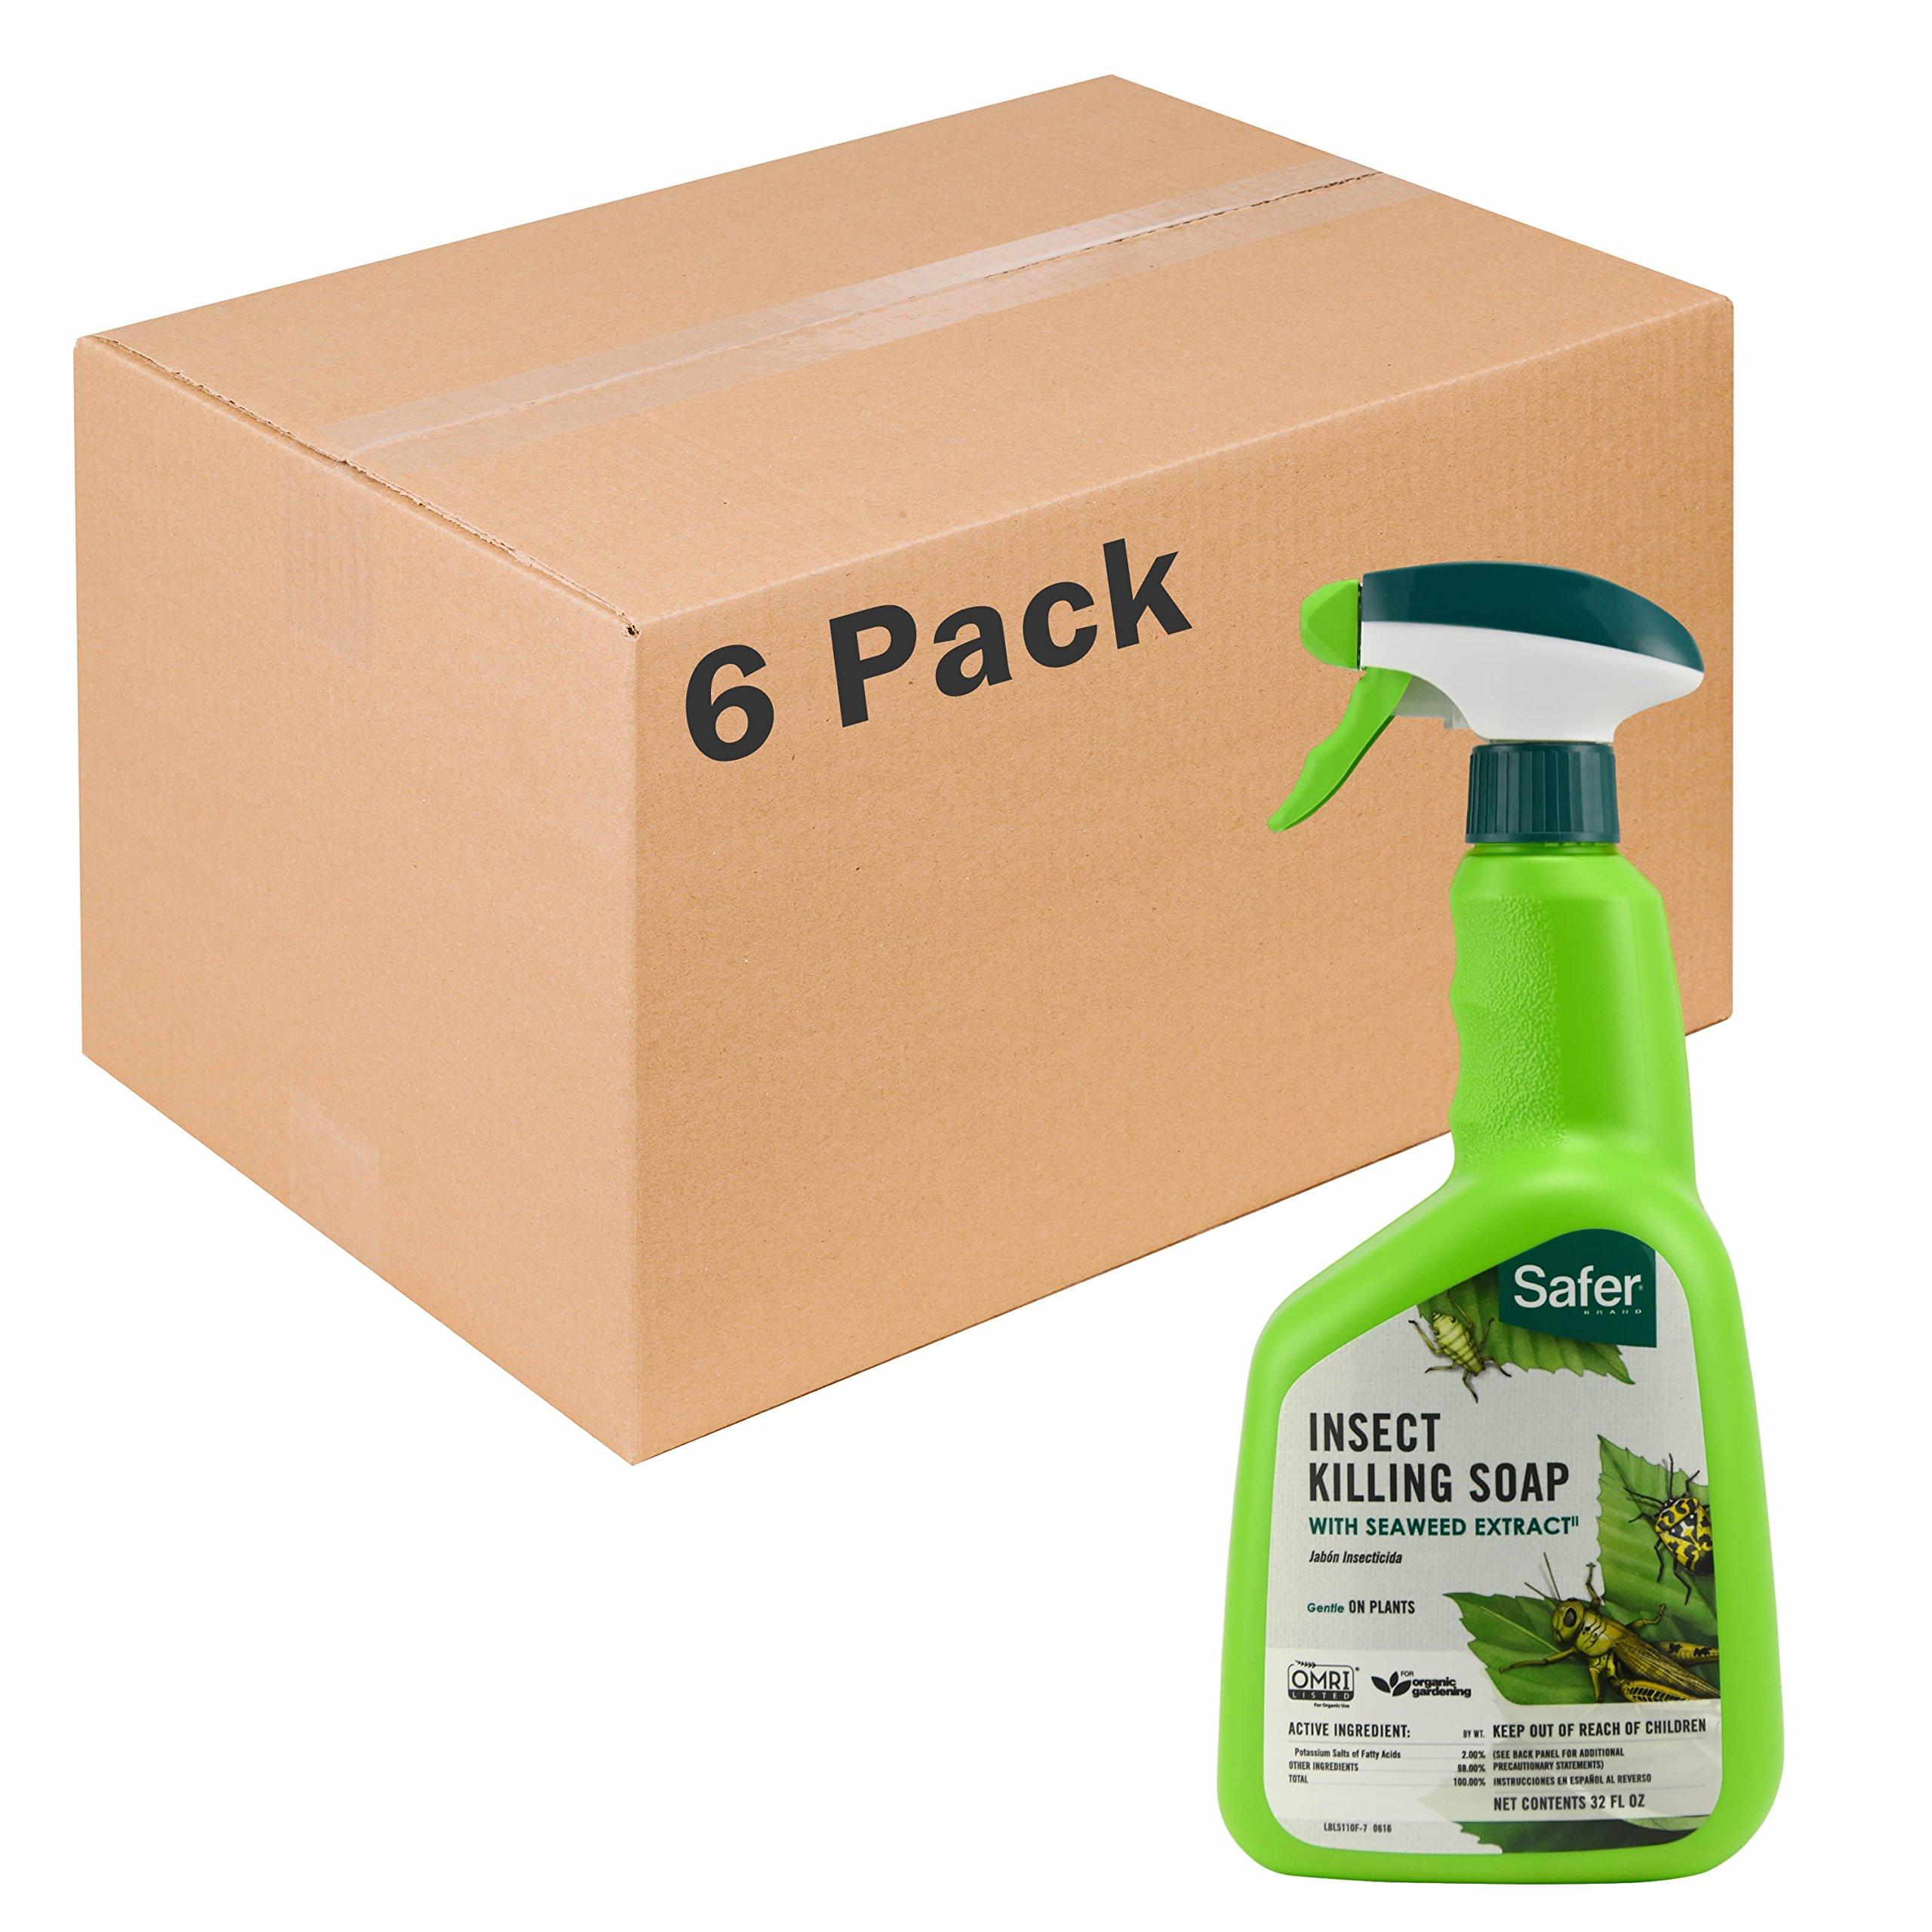 Safer Brand insect Killing Soap 32oz RTU - 6 pack 5110-6